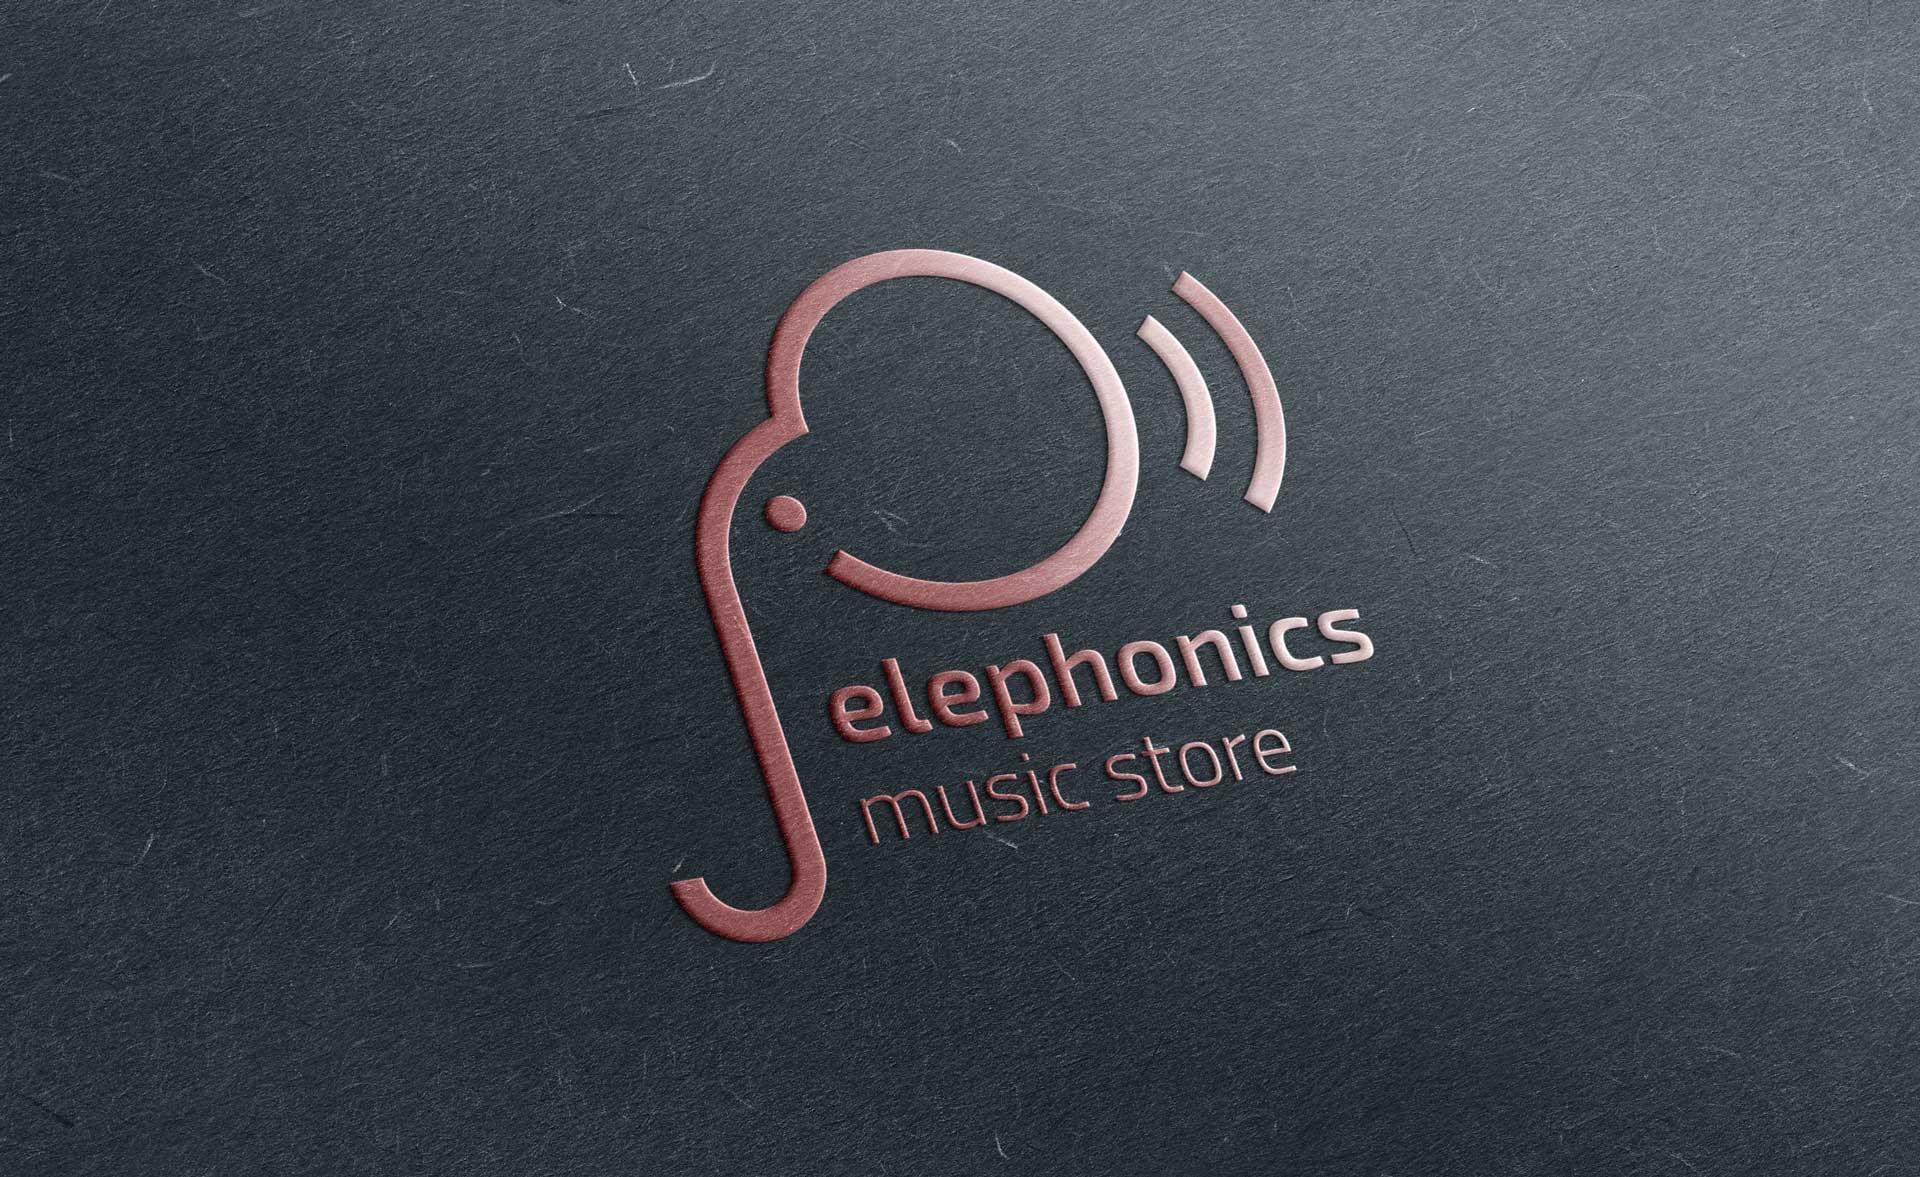 bordado-elephonics-v11